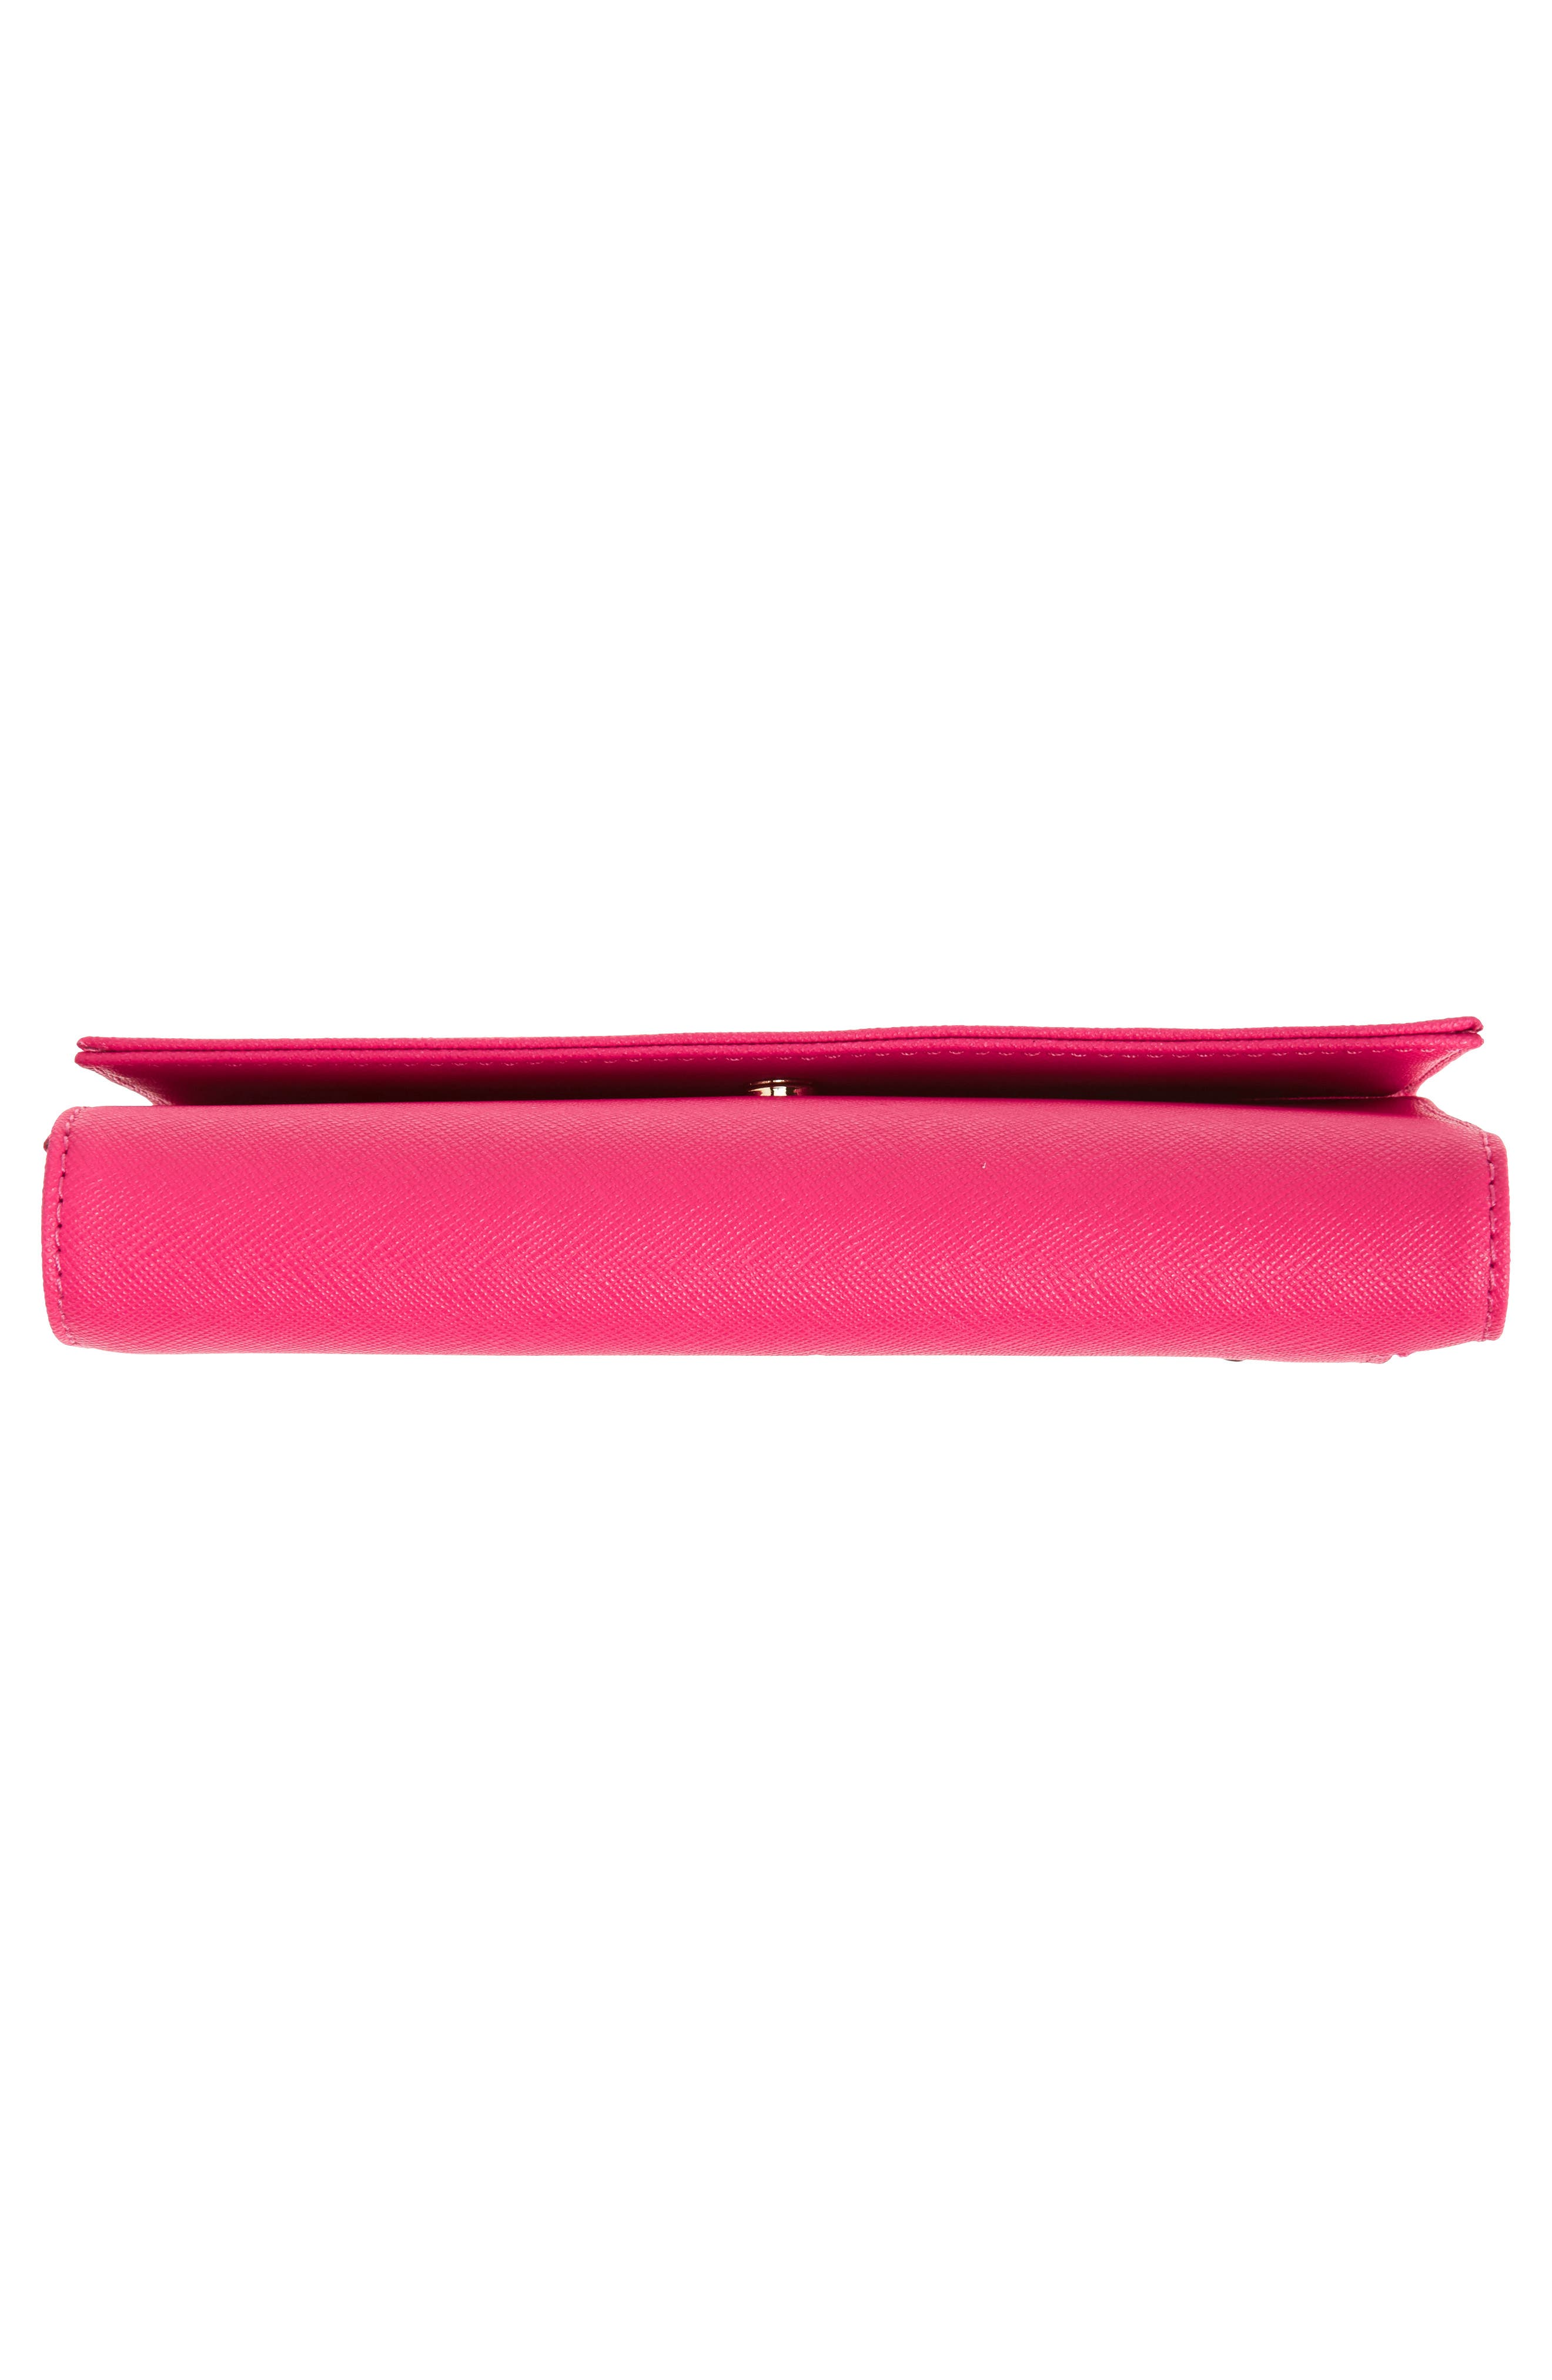 leather iPhone 7/8 & 7/8 Plus case,                             Alternate thumbnail 44, color,